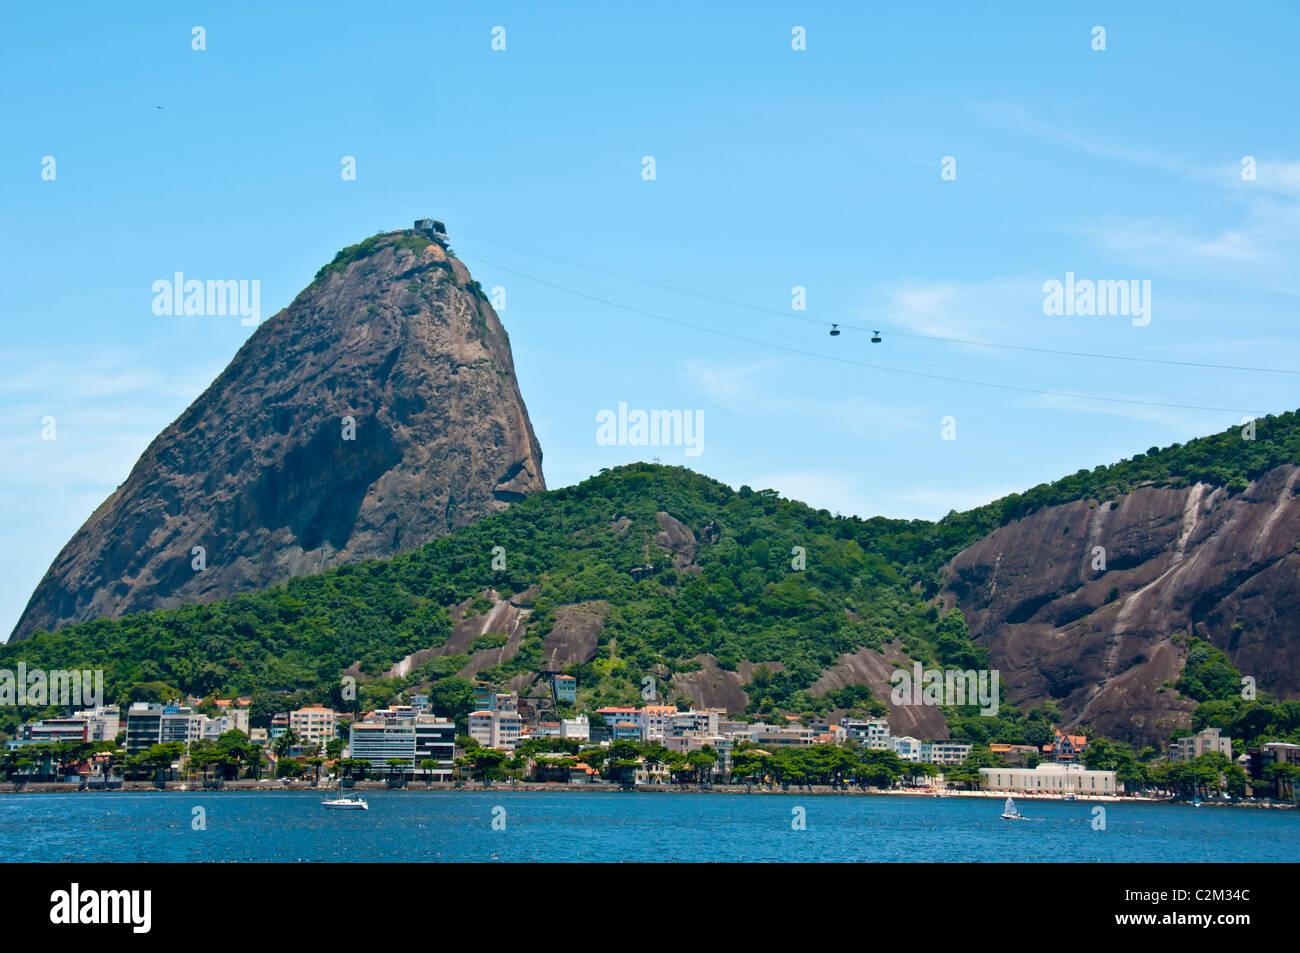 Tourist ride cablecars to the top of Sugarloaf Mountain, Rio de Janeiro,Brazil Stock Photo